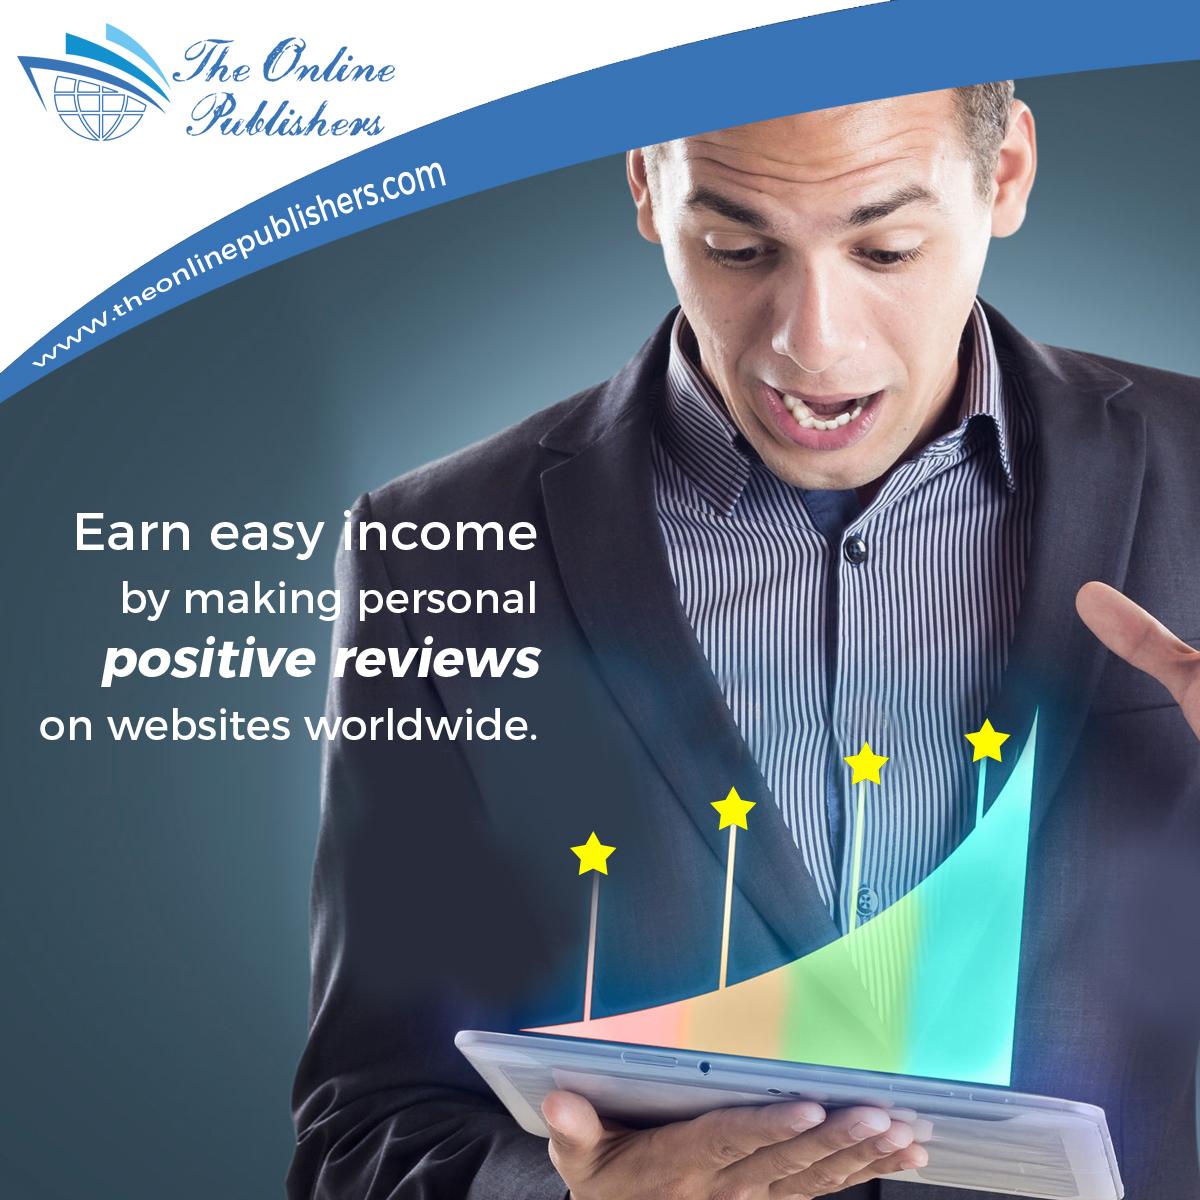 Make Money Online as a Reviewer